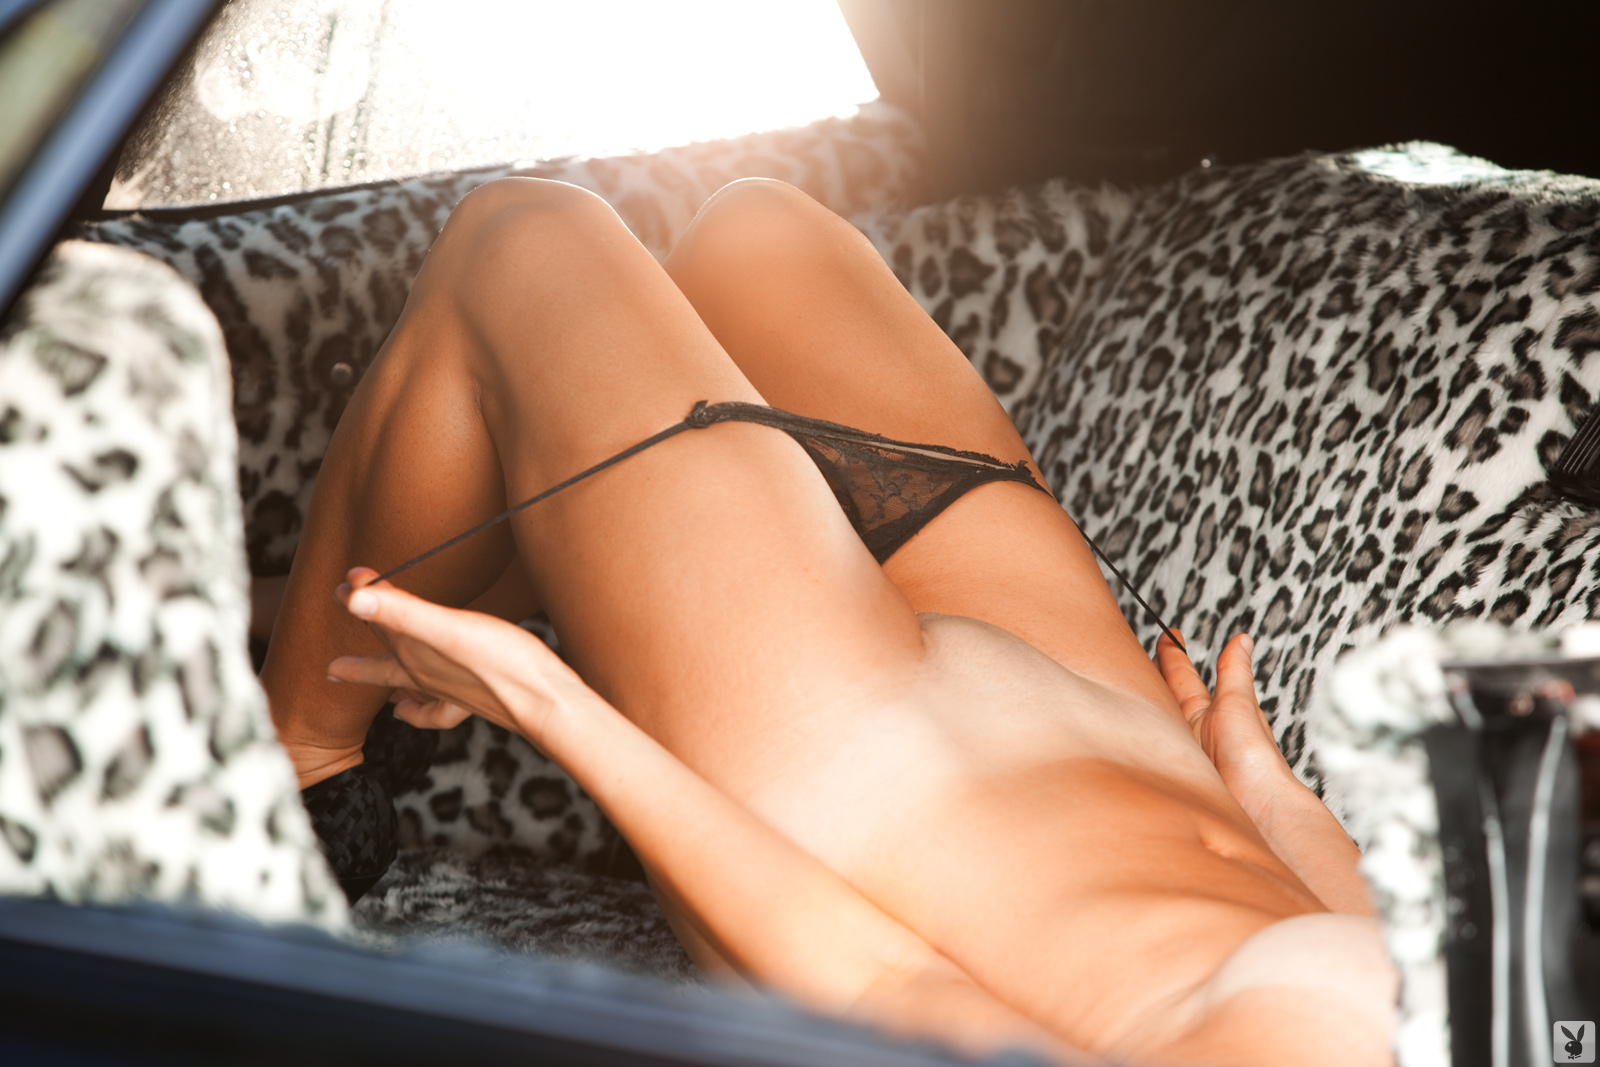 nichole-van-croft-pontiac-bonneville-nude-playboy-17